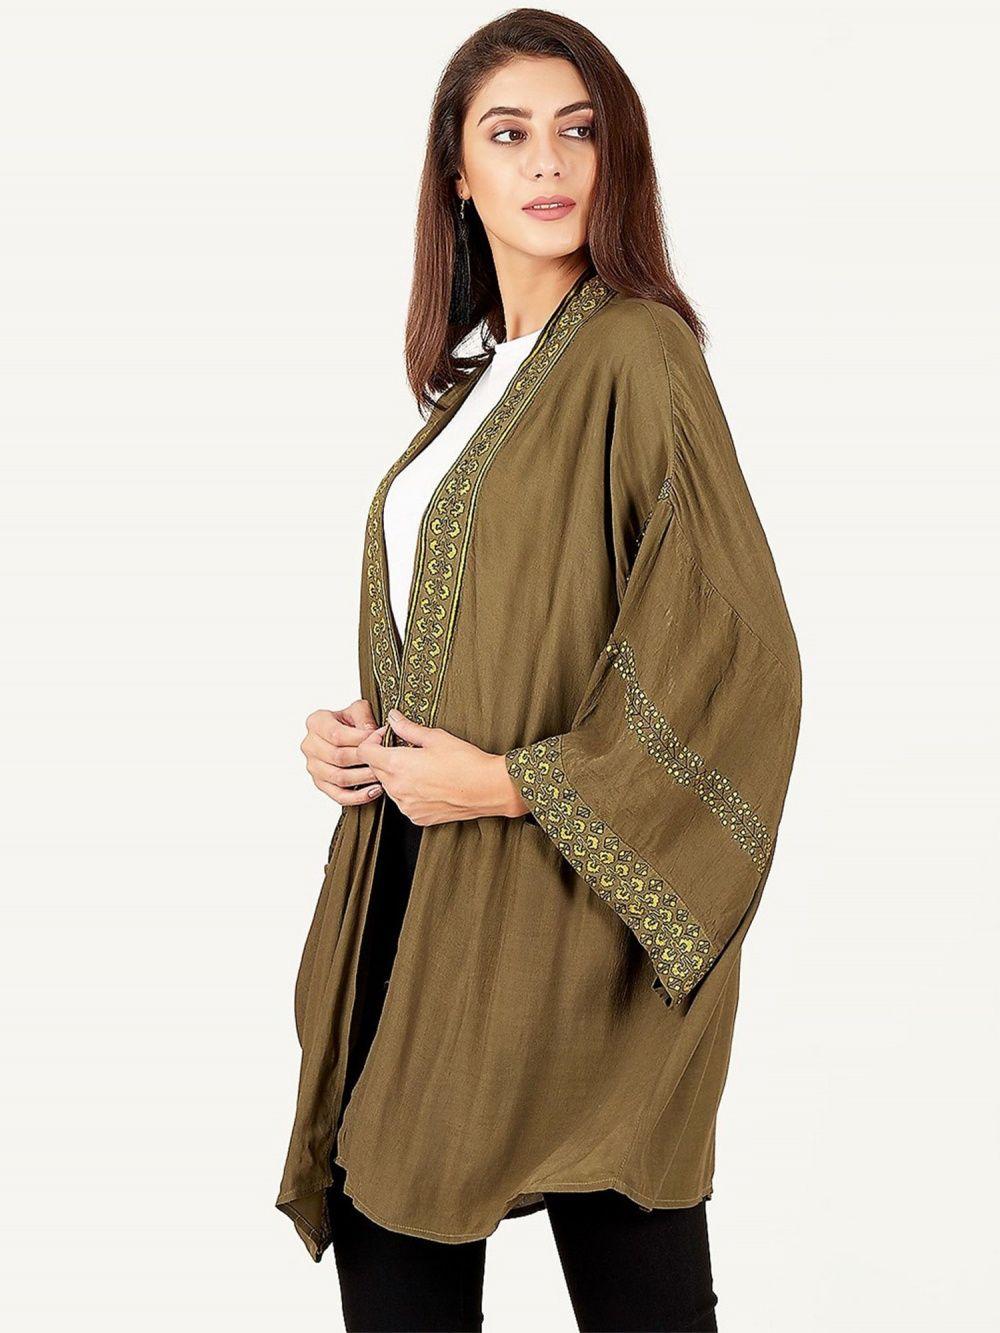 cfdeee0dd7 Label Ritu Kumar Jackets : Buy Label Ritu Kumar V-Neck Full Sleeves ...